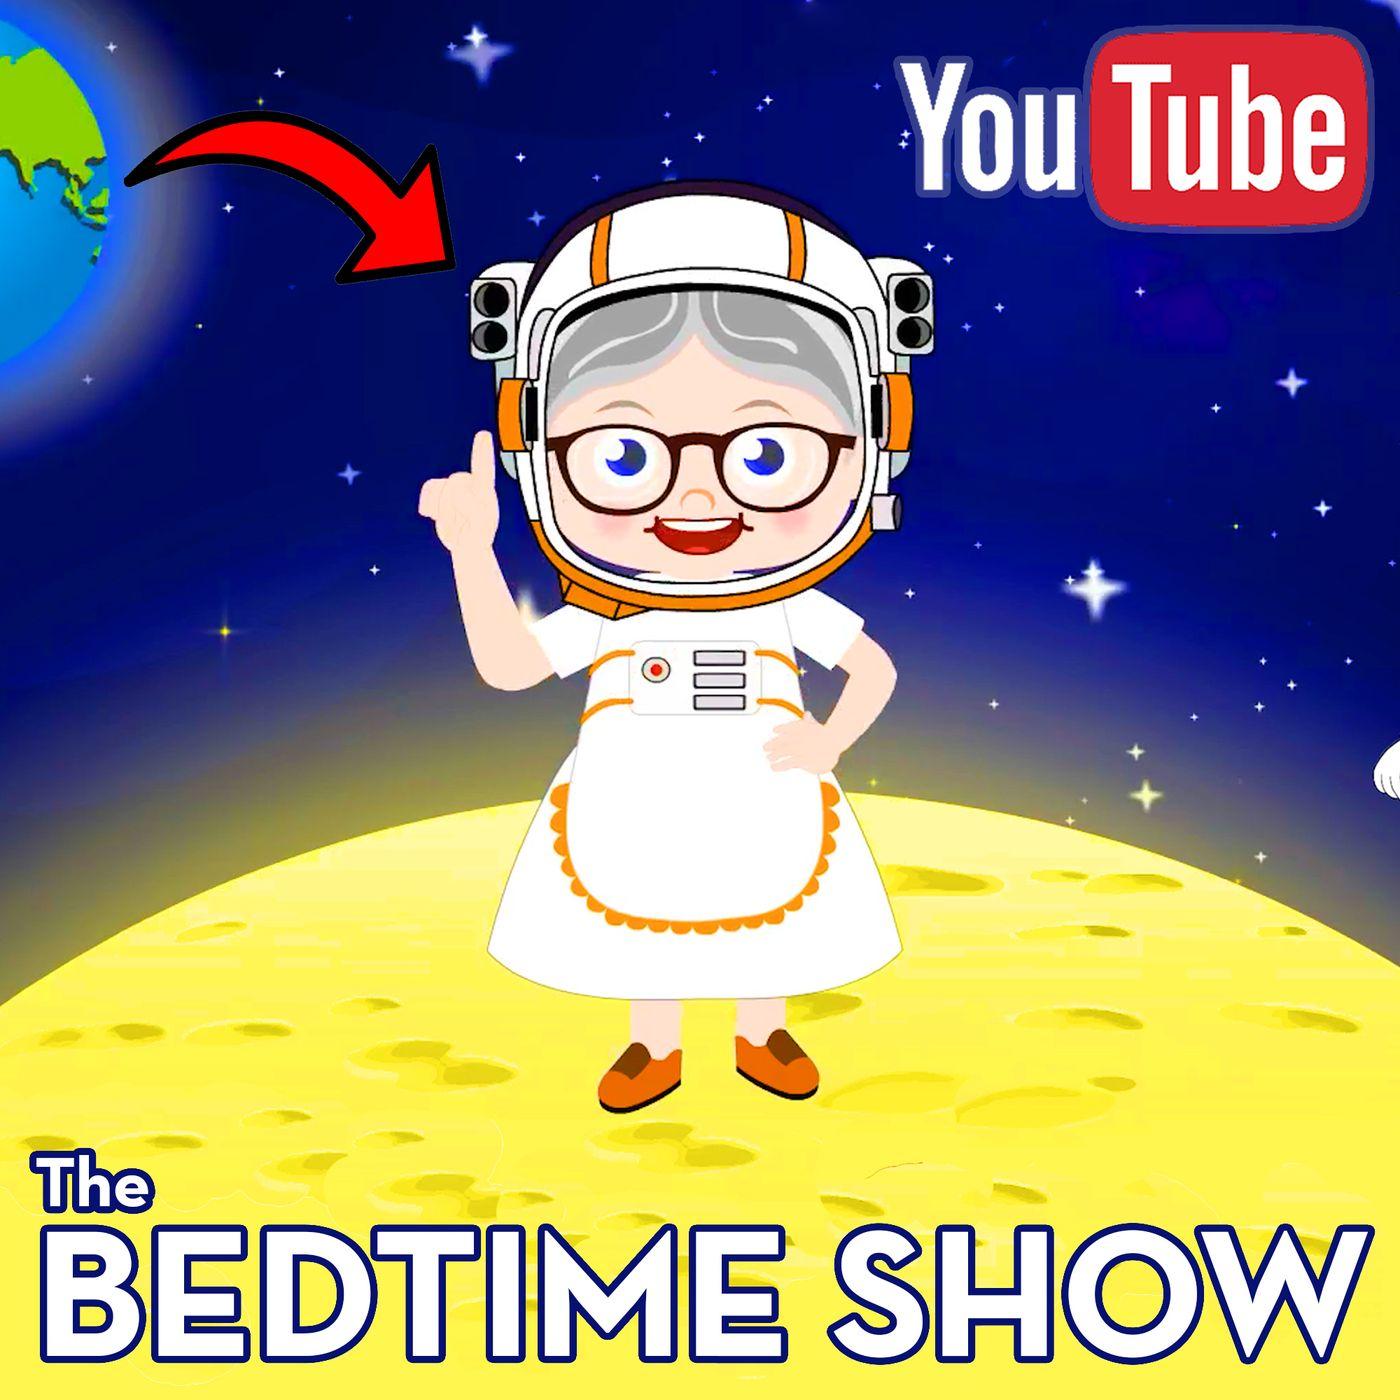 The Bedtime Show - SNEAK PEAK!